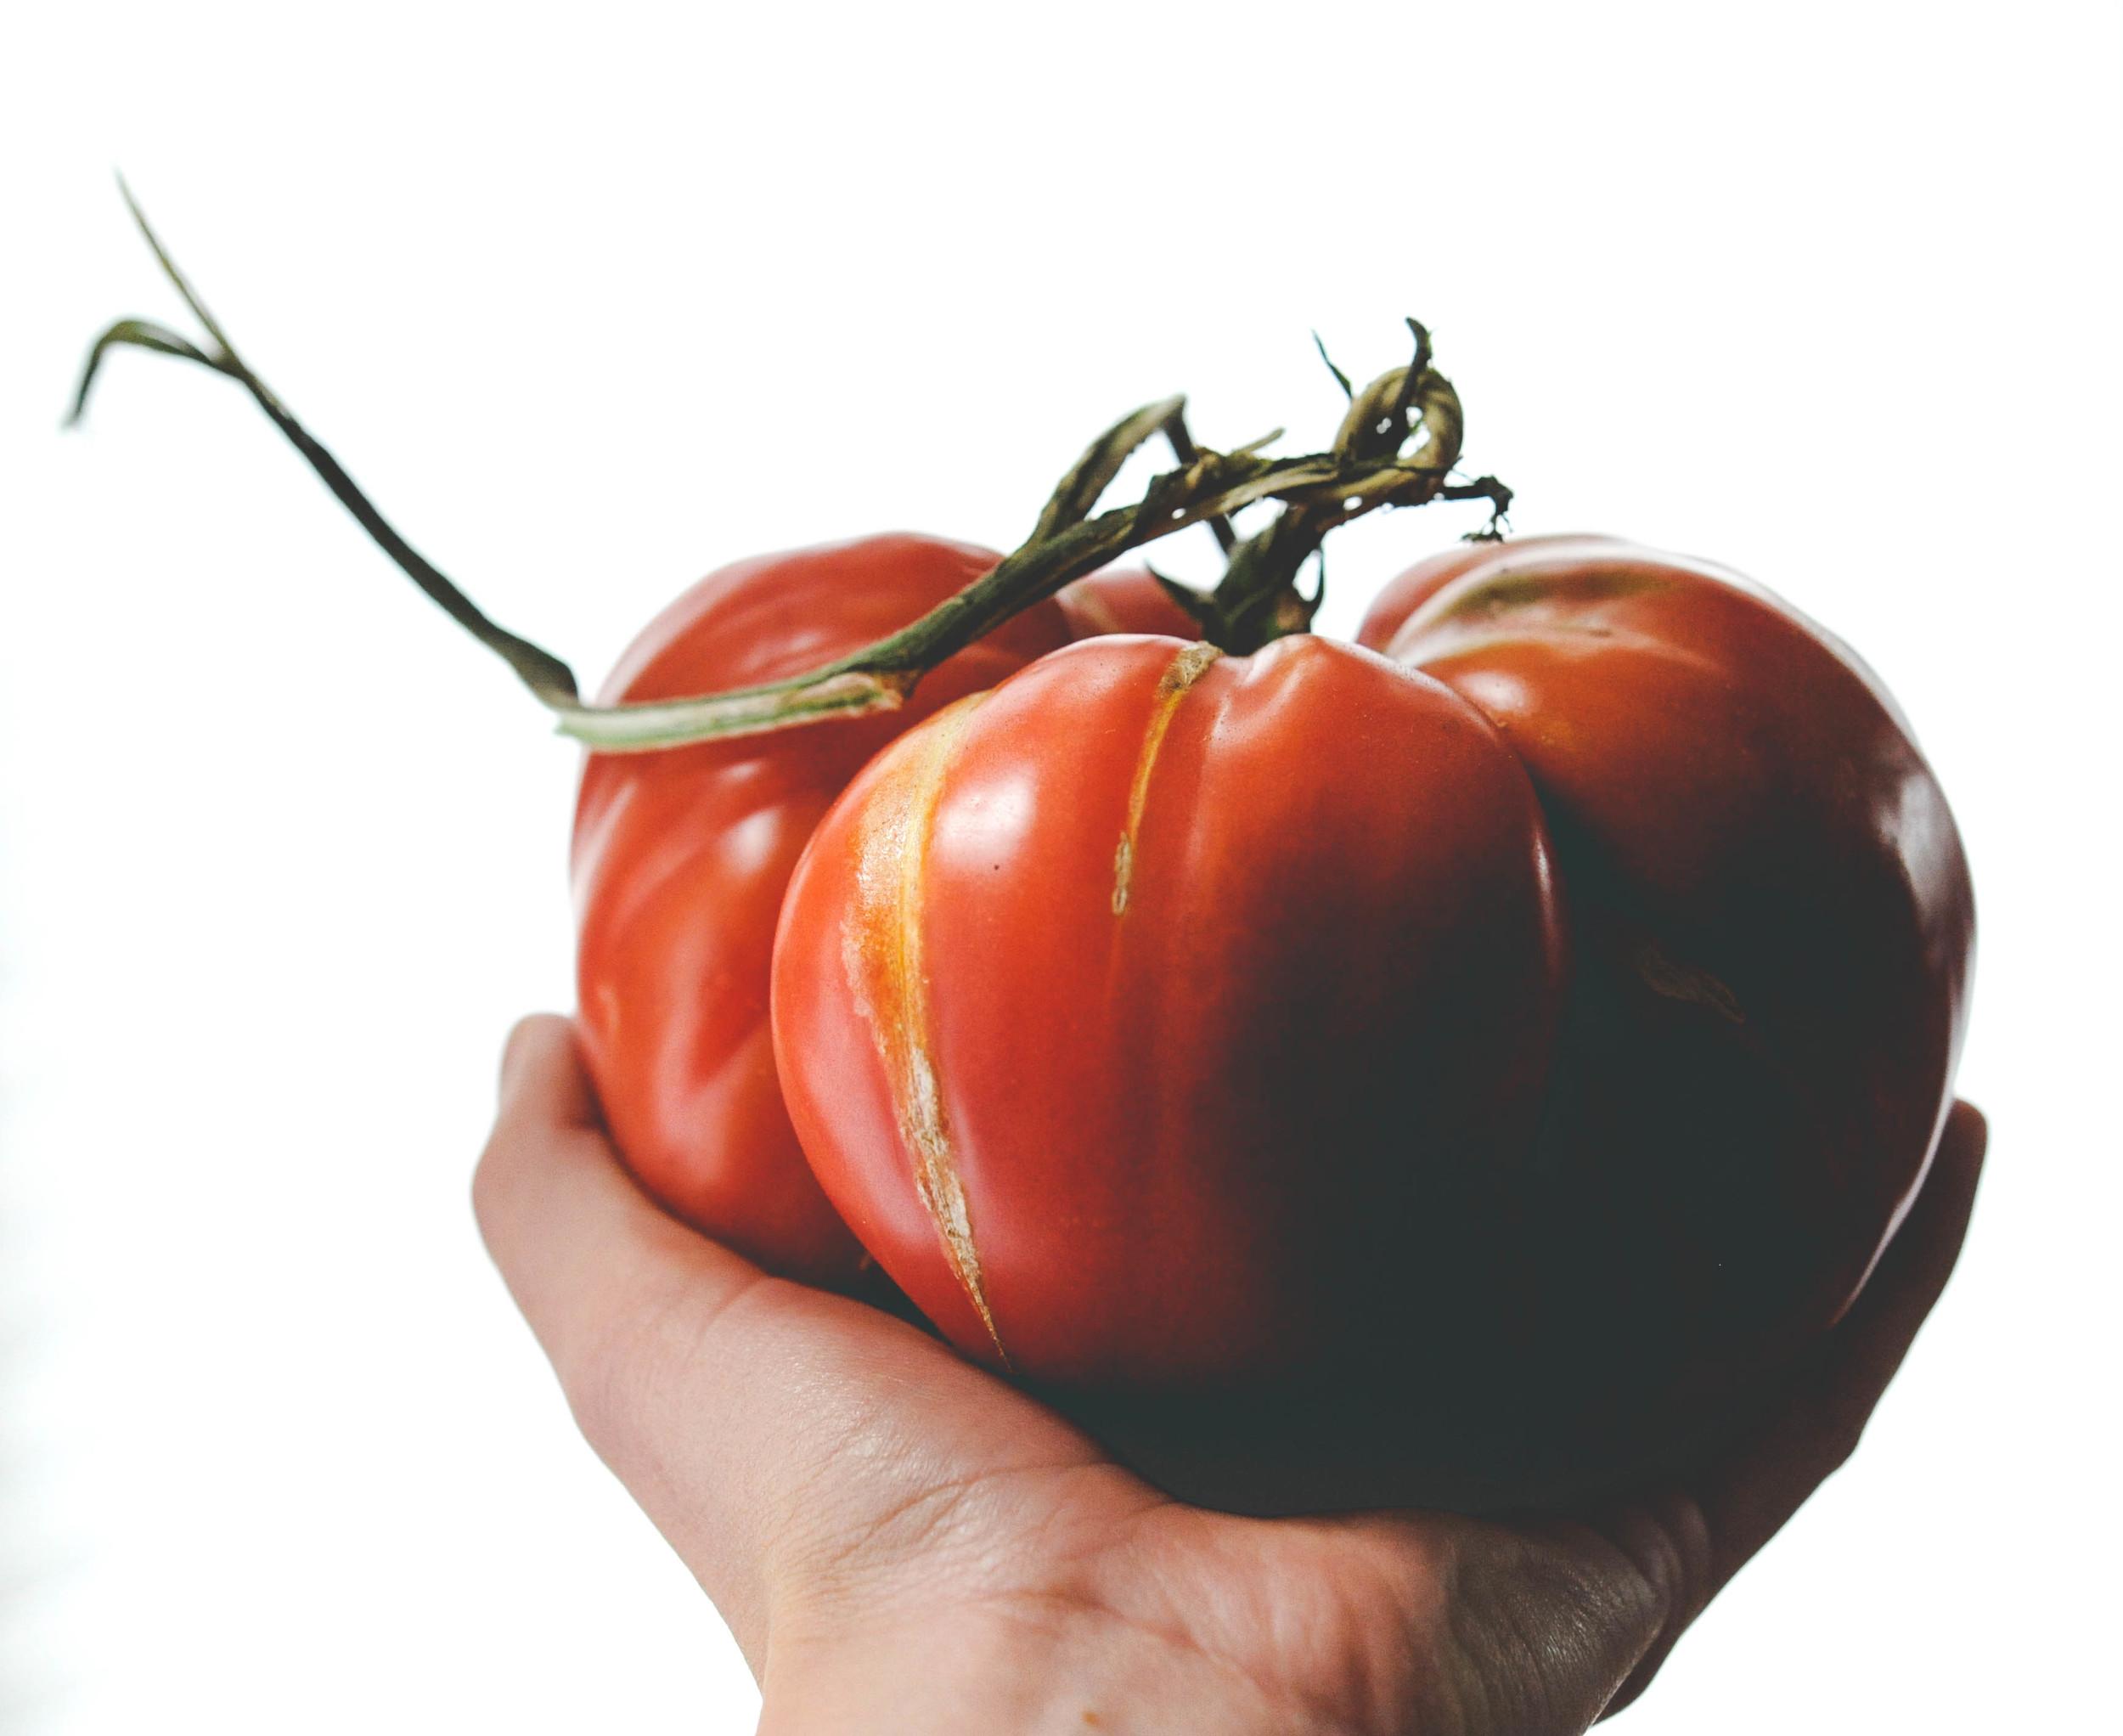 Cherokee Purple Heirloom Tomato                                 Photo by: Hilary Dahl